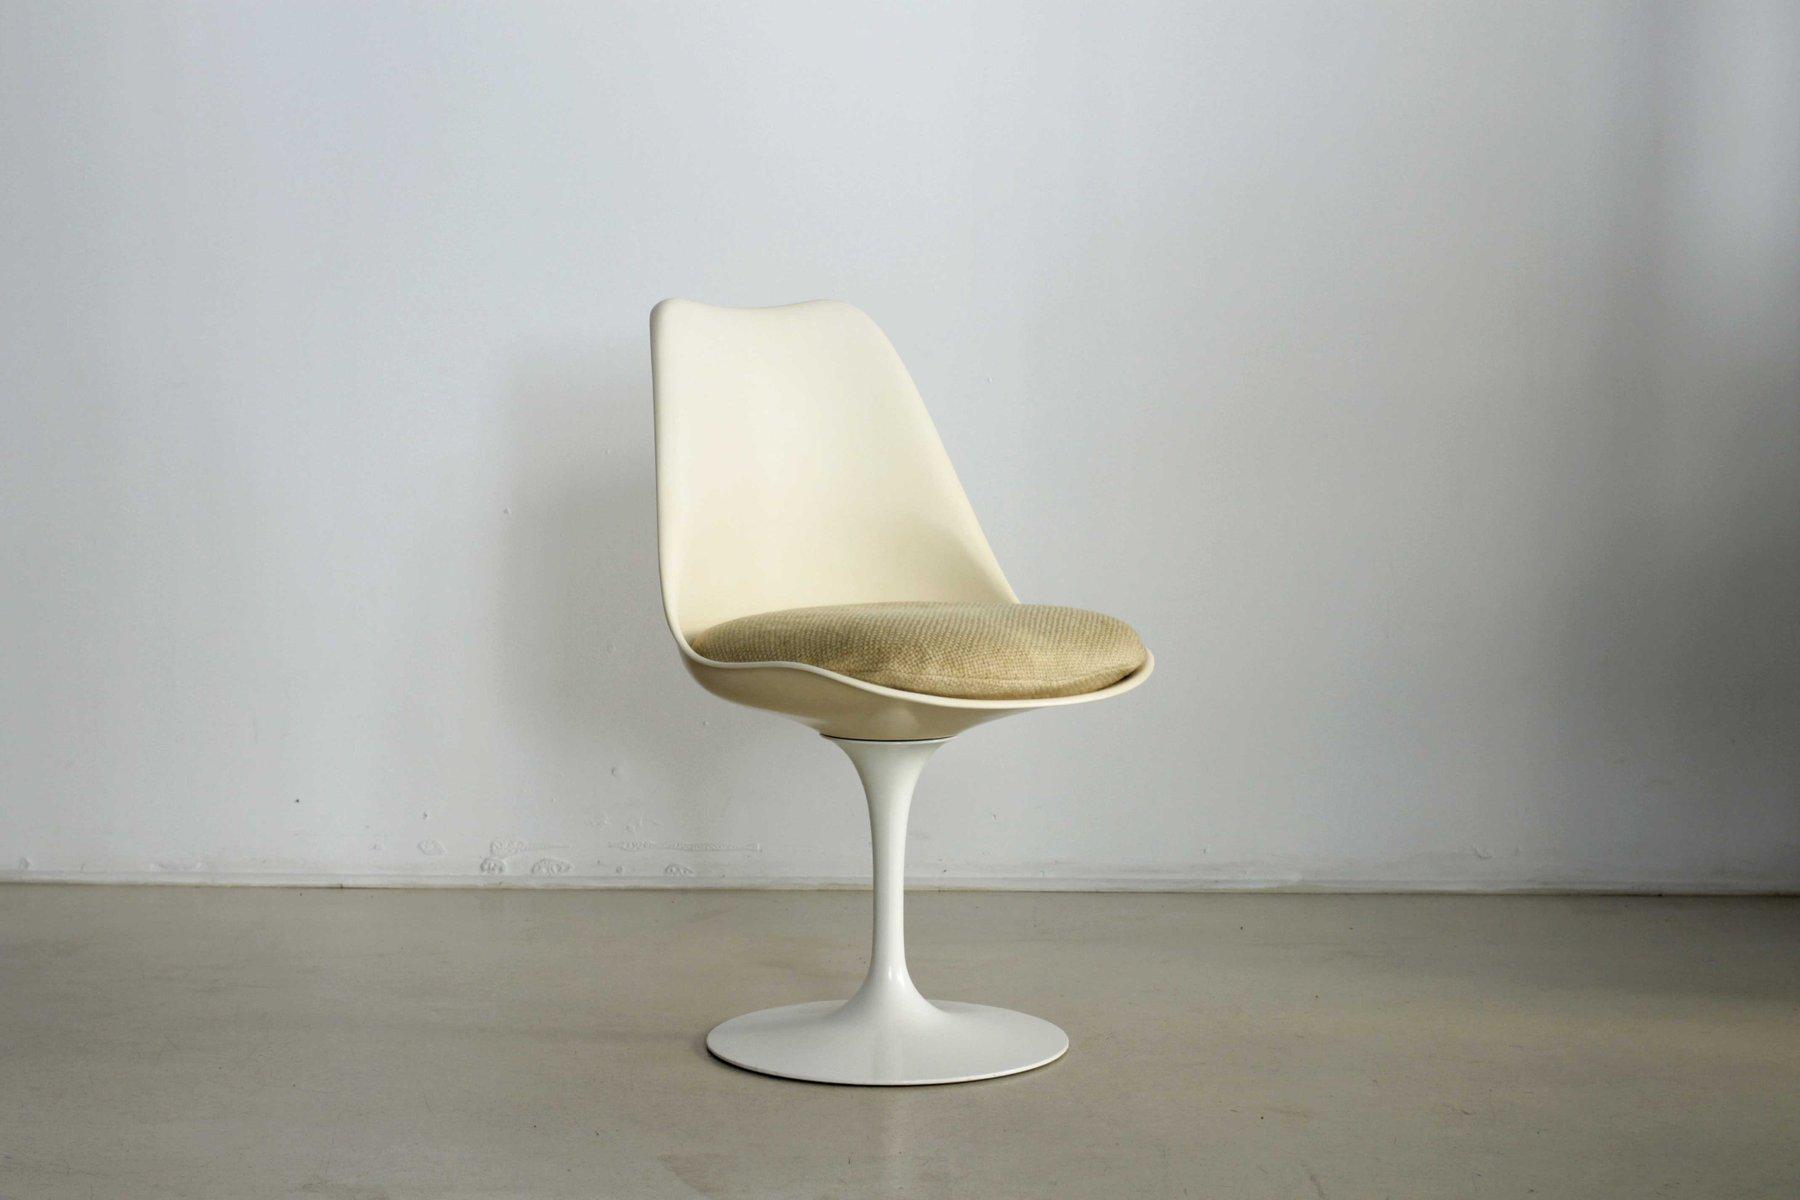 Swivelling Tulip Chairs by Eero Saarinen for Knoll 1960s Set of